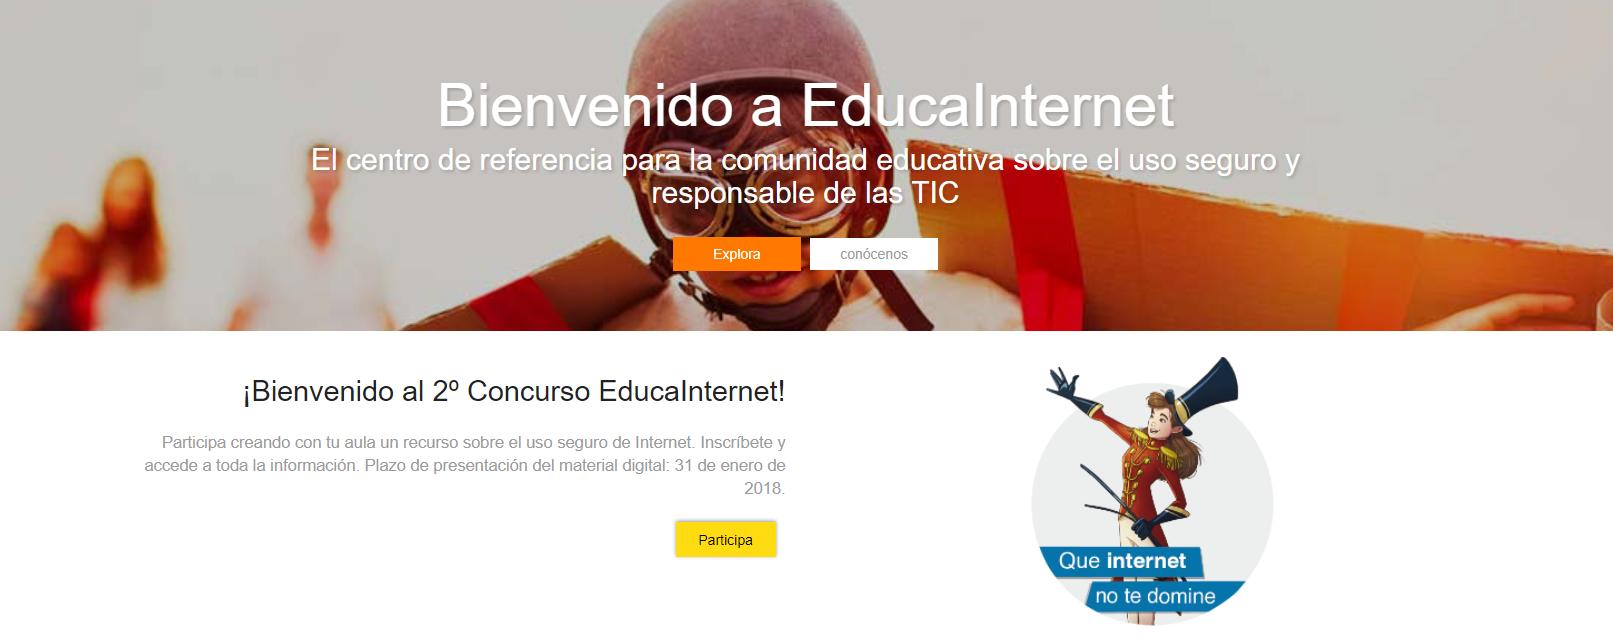 EducaInternet